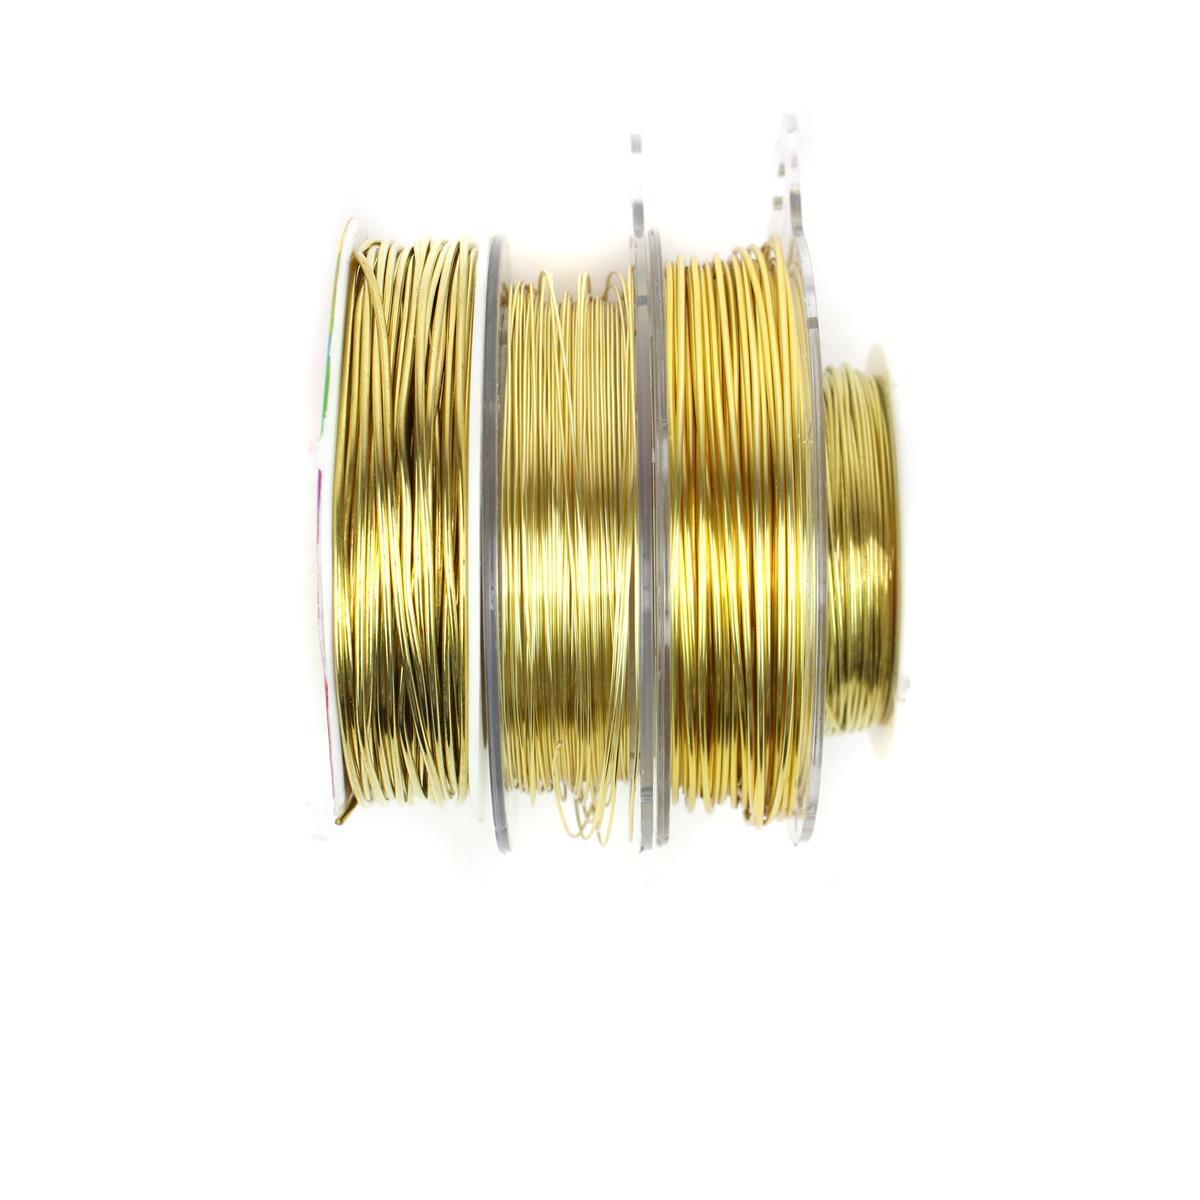 Copper Wire Bundle : M gold coloured copper wire bundle inc mm